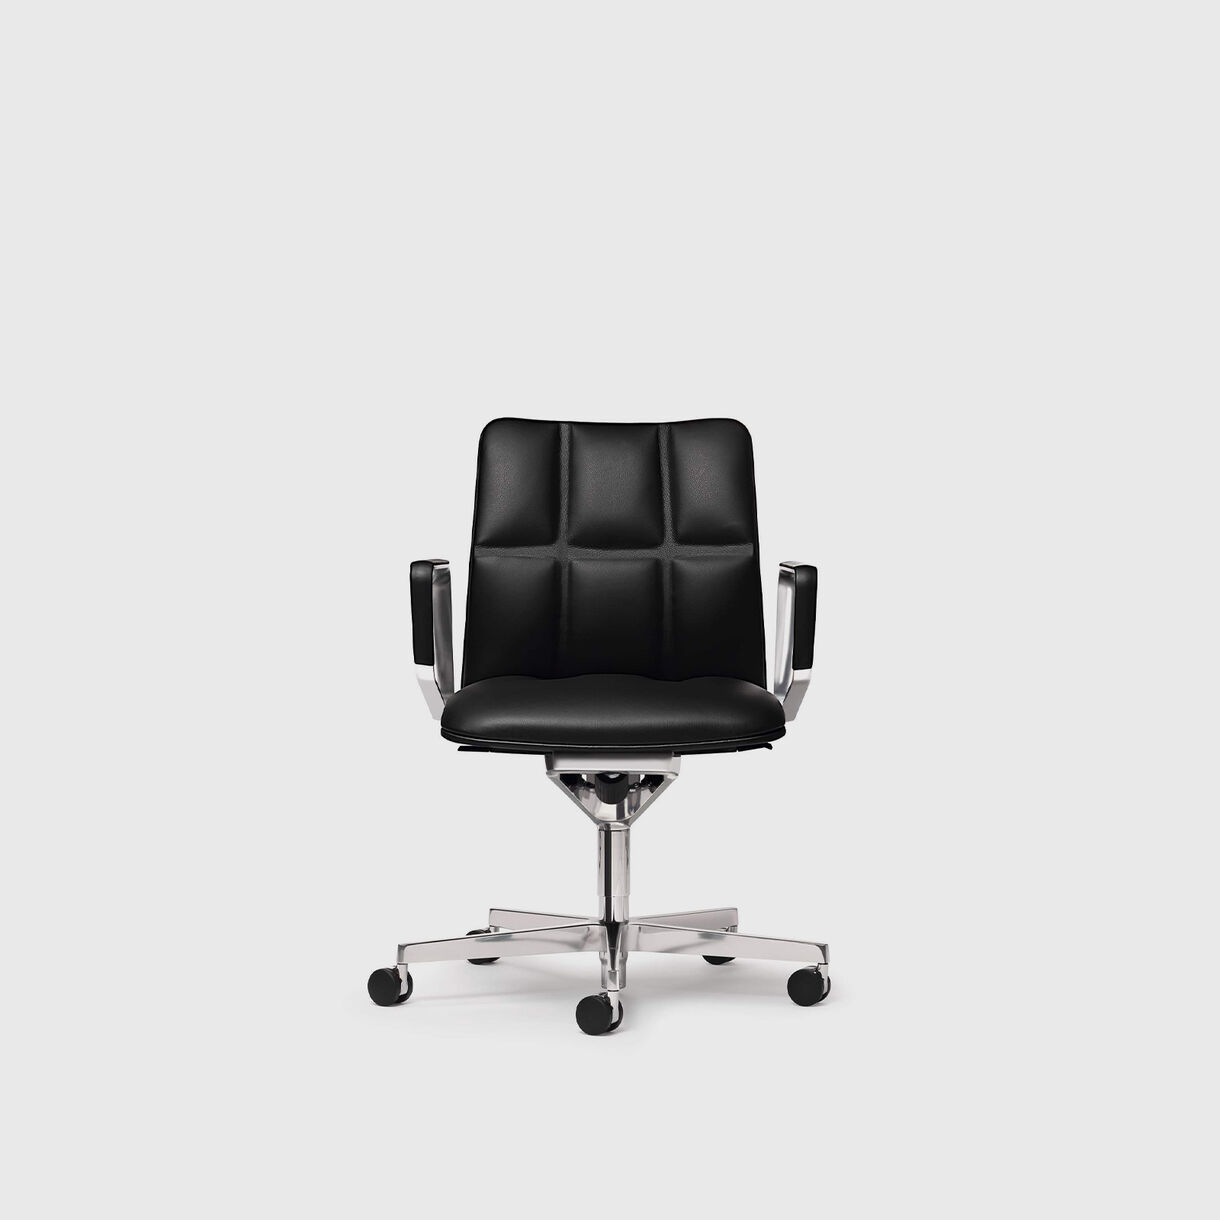 Leadchair Executive, Low Back, Black